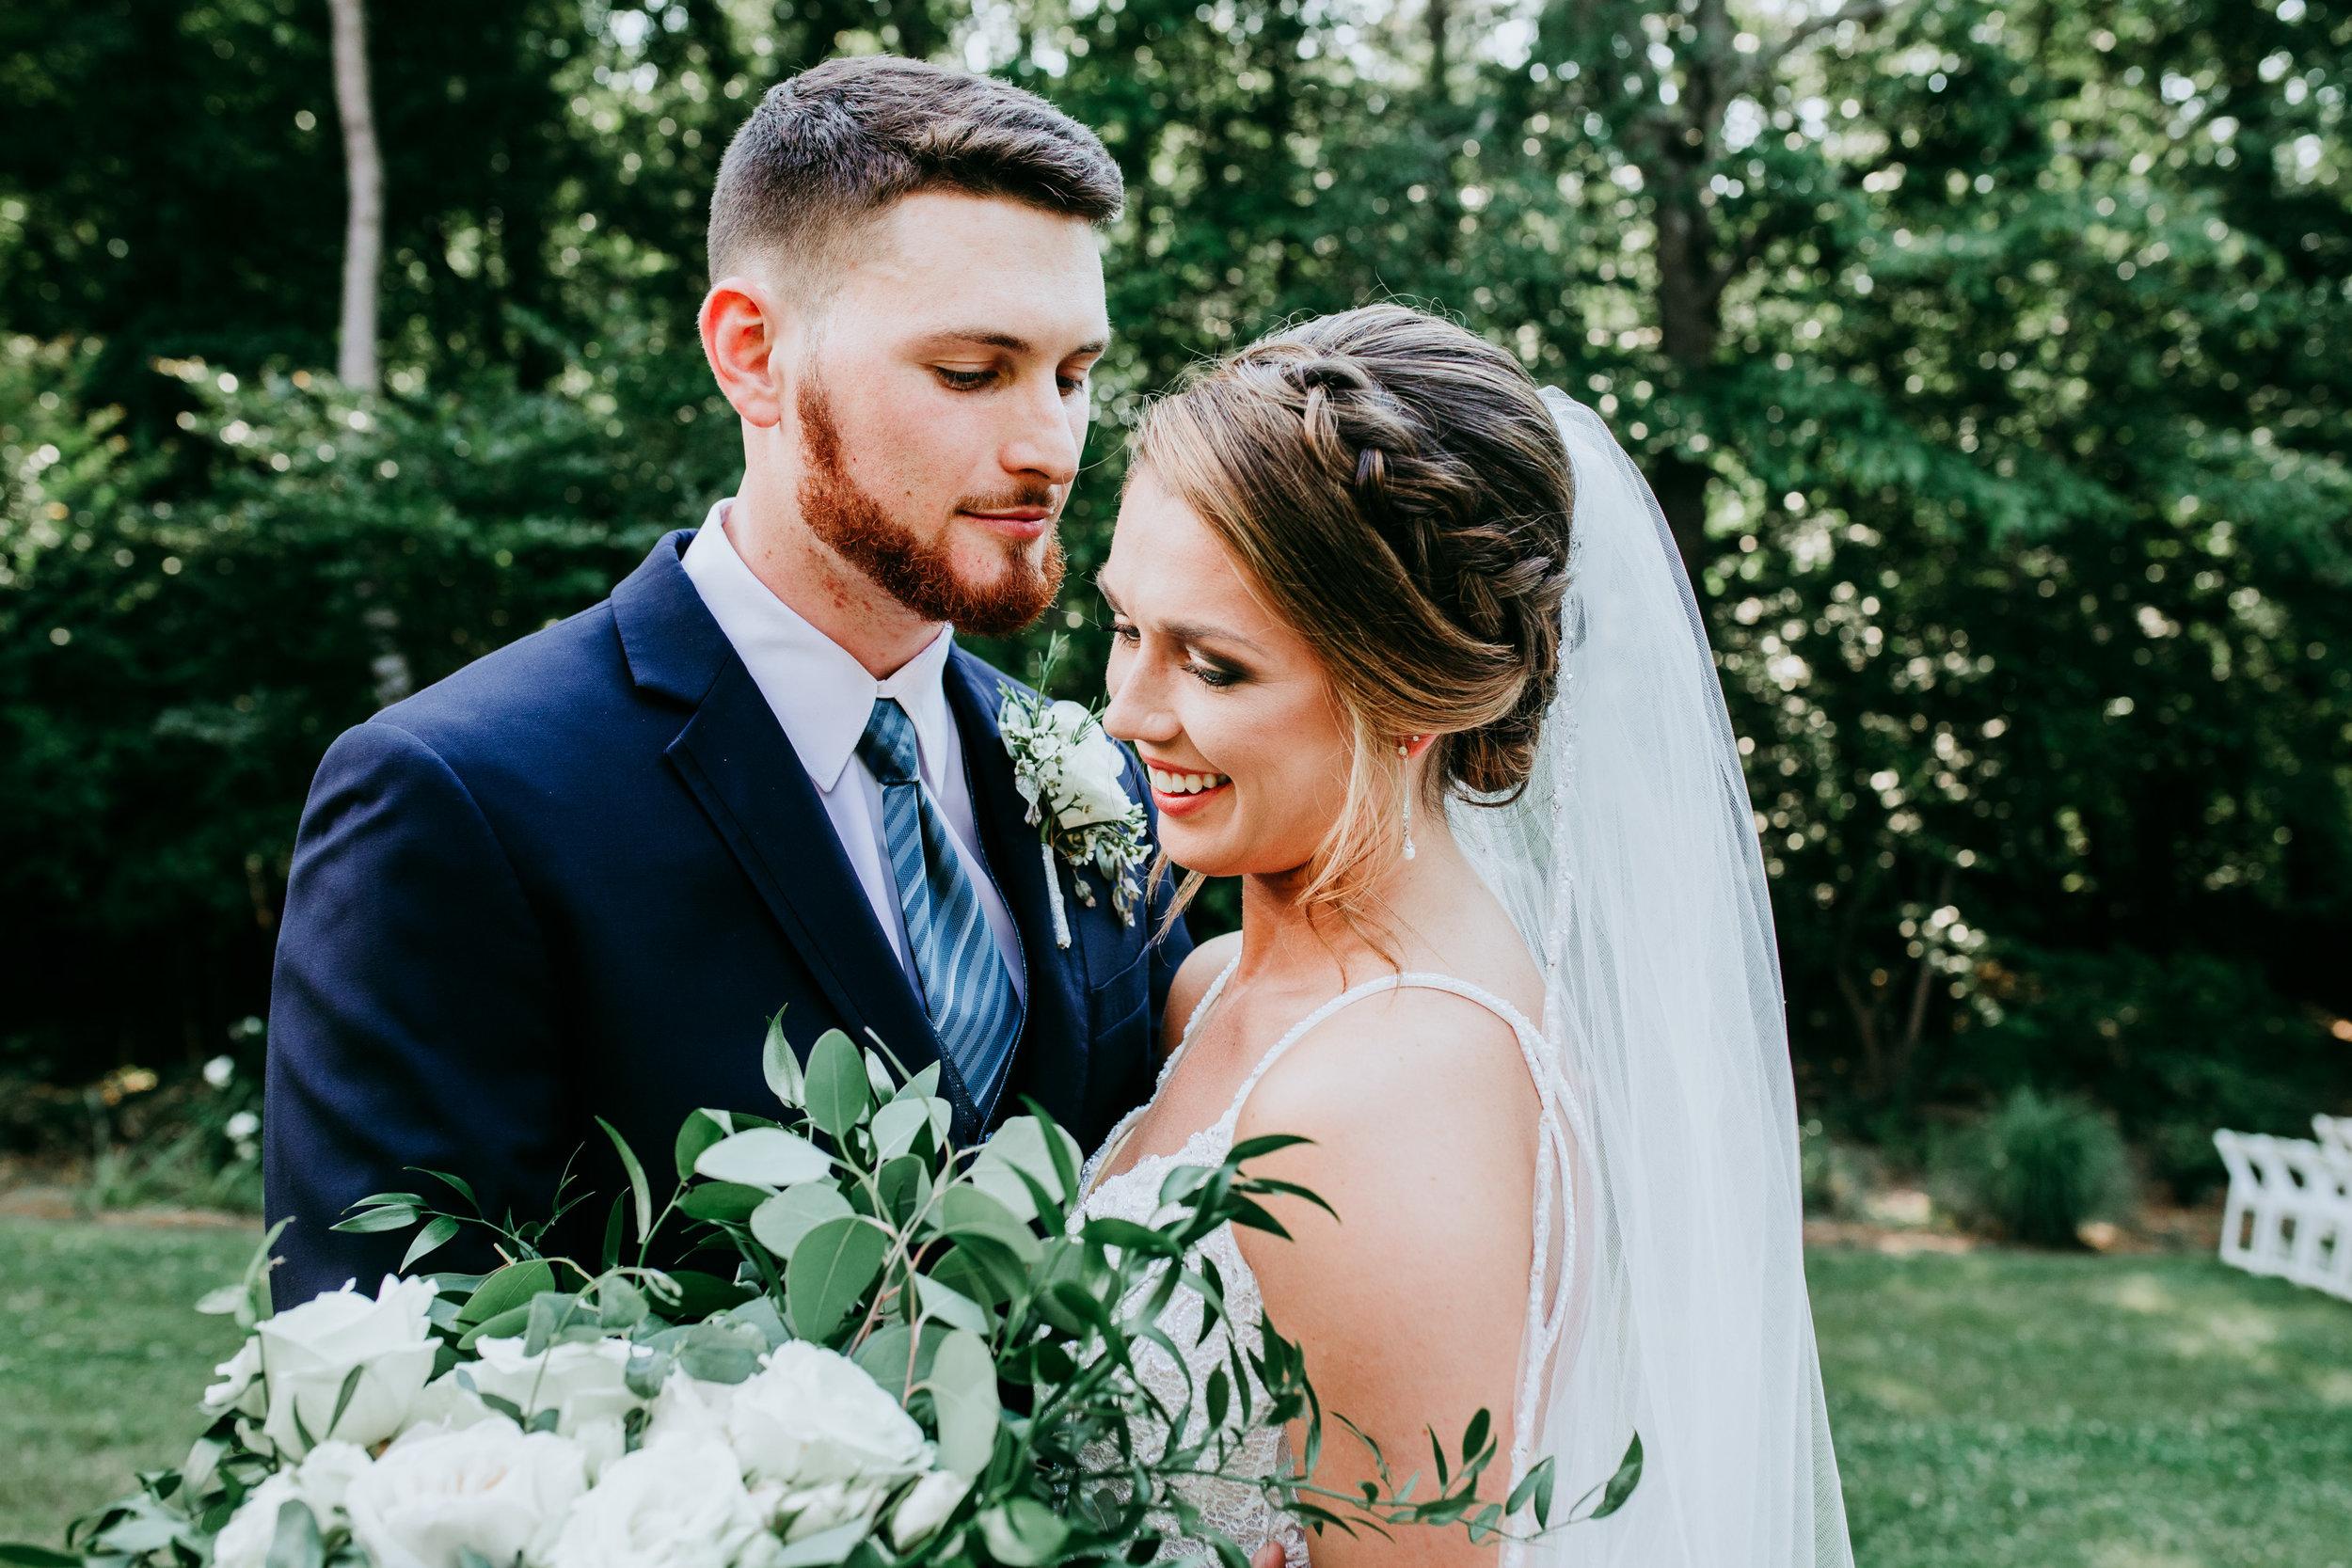 outdoor-wedding-locations.jpg